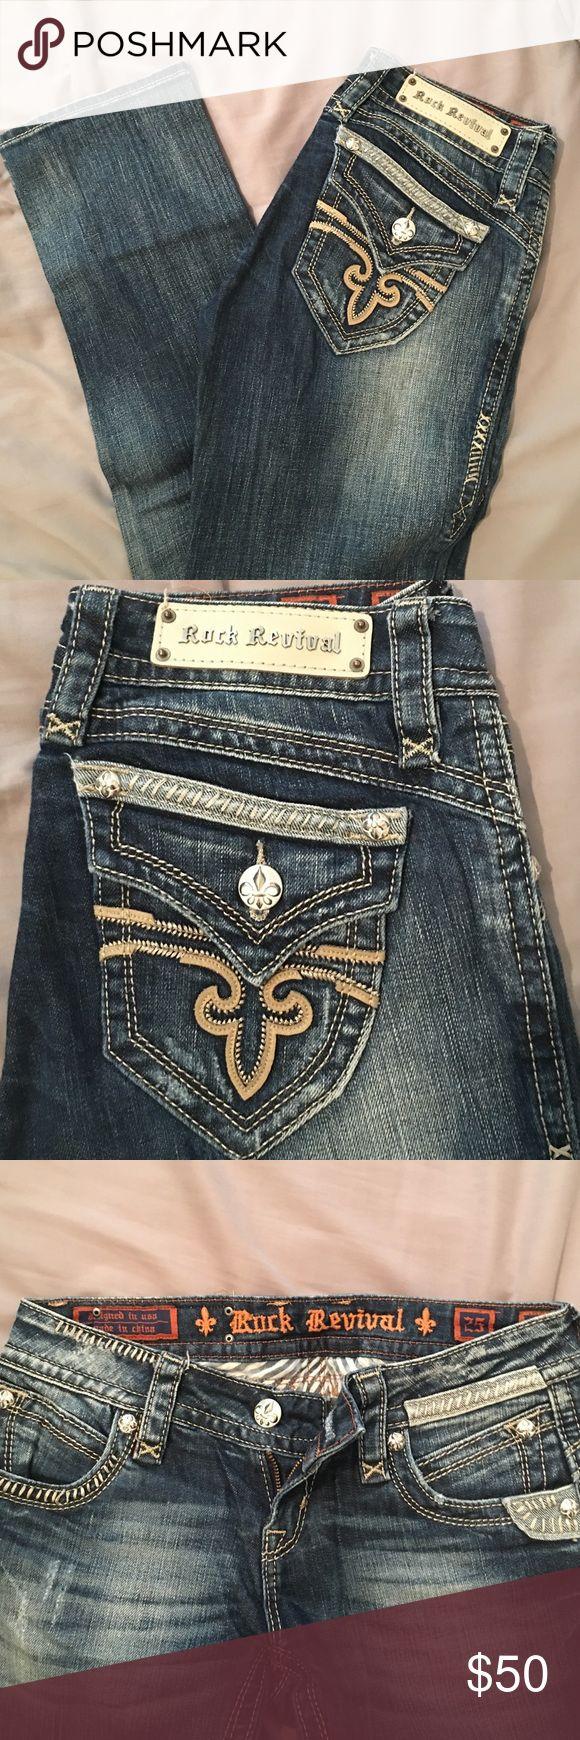 Rock Revival Jeans Womens